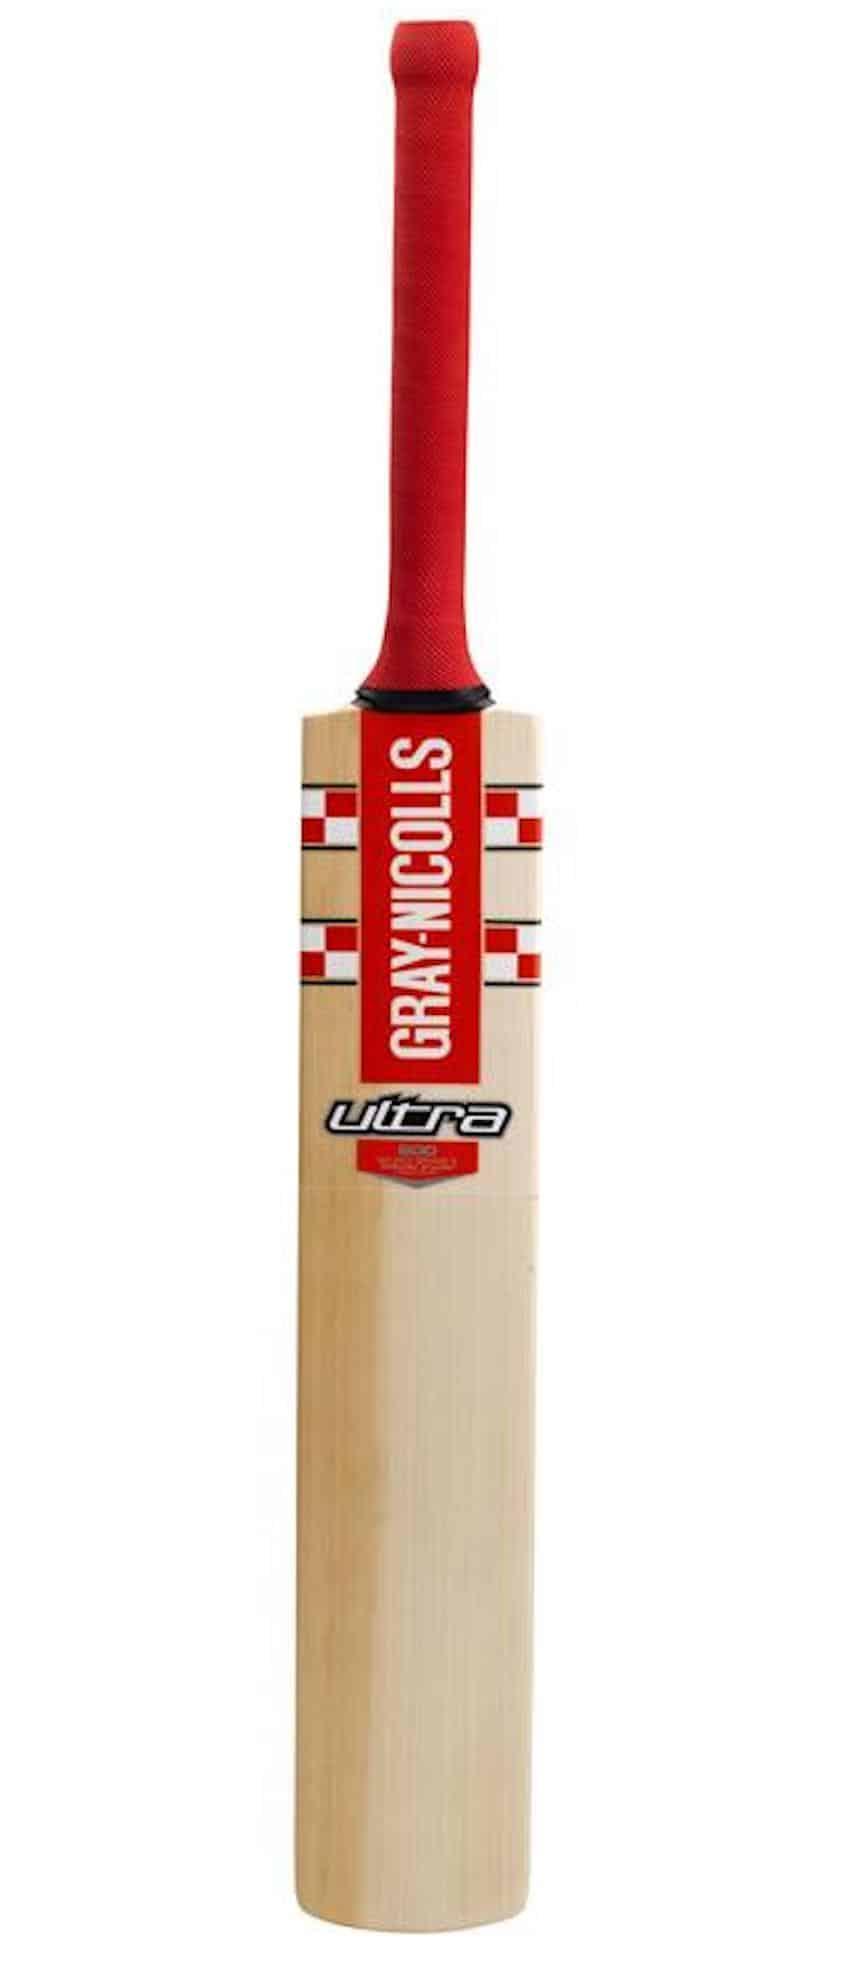 Ultra 800 Gray Nicolls Cricket Bat